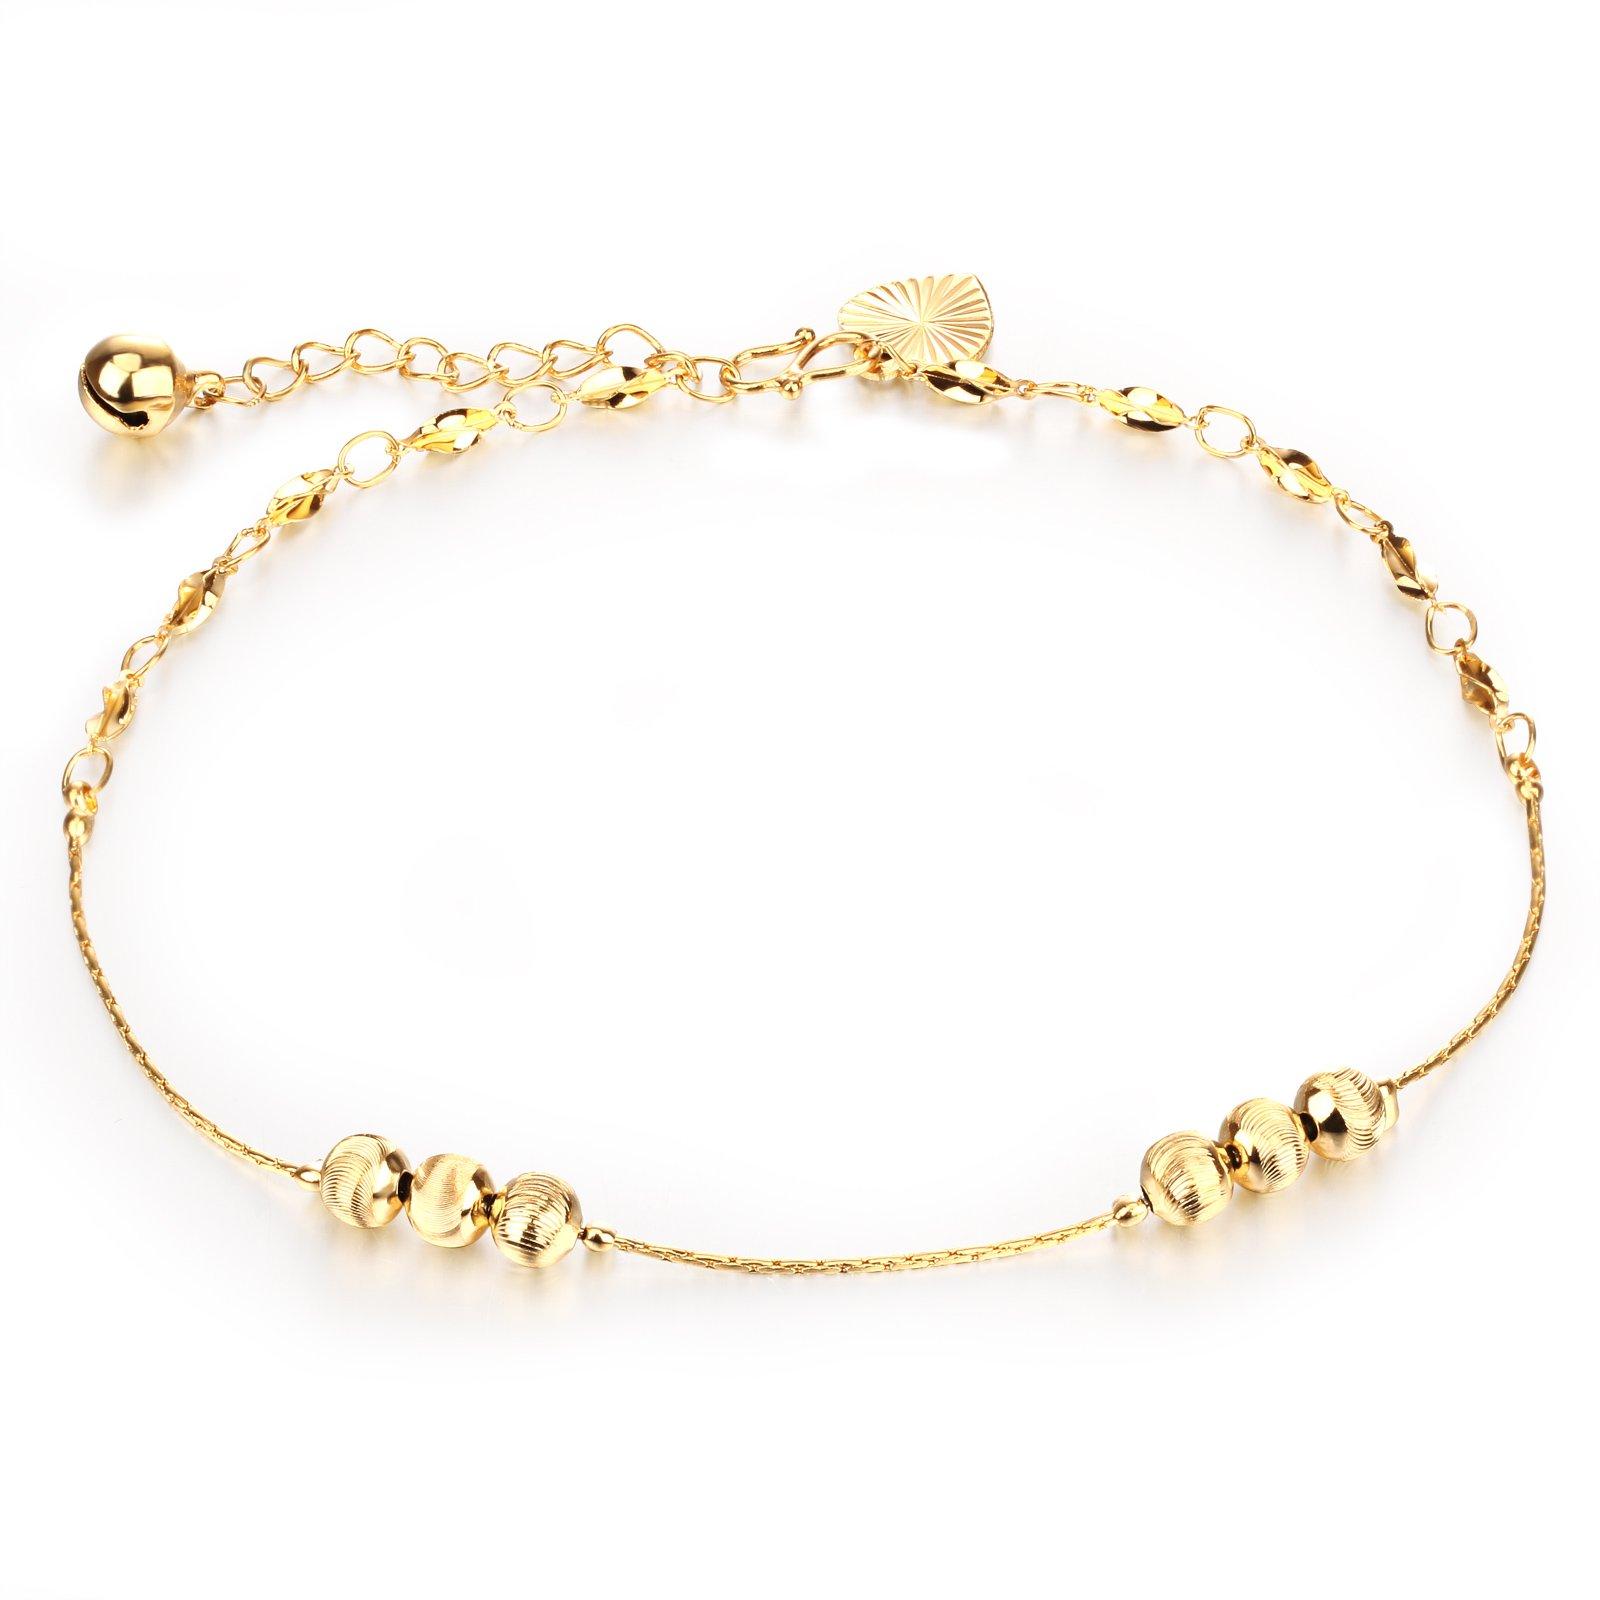 Ubeauty 18k Yellow Gold Plated Lantern Charm Anklet Bracelet Sandal Beach Jewelry, Adjustable